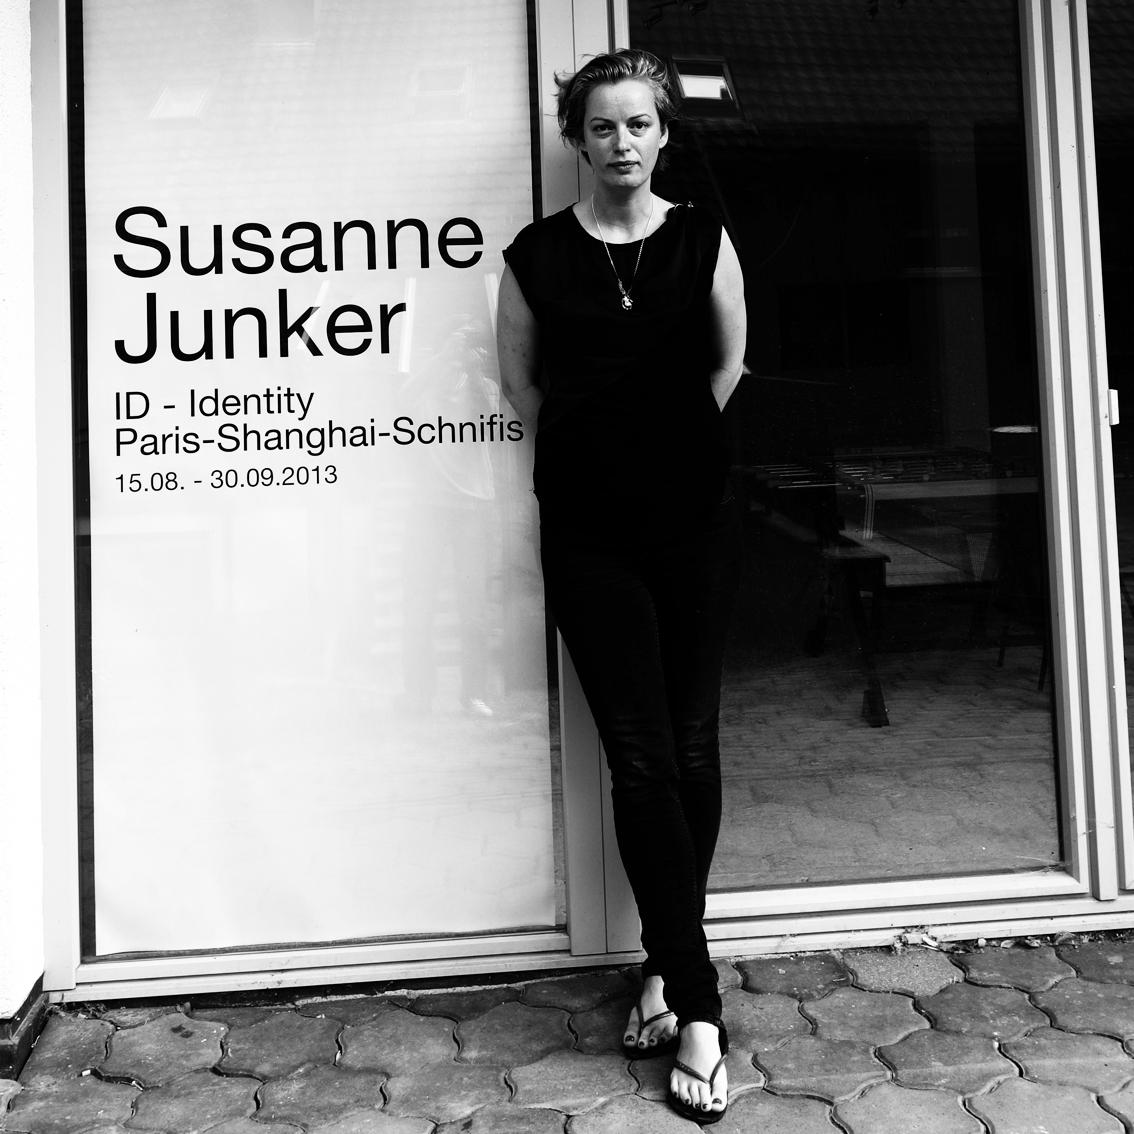 Susanne Junker in Schnifies, Austria, 2013.